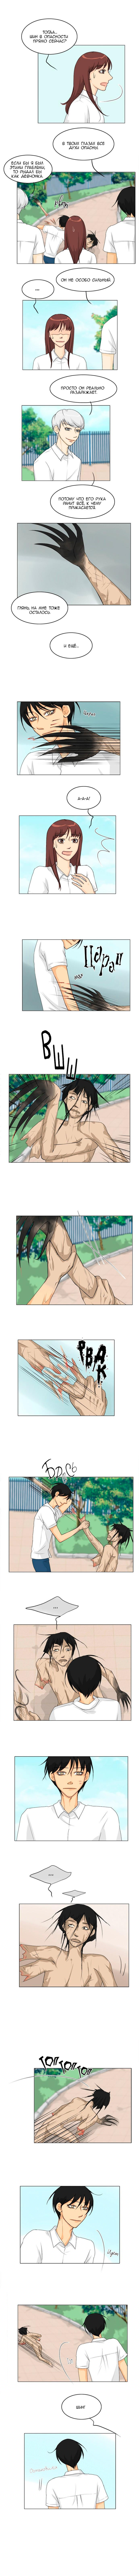 https://r1.ninemanga.com/comics/pic2/8/31048/426363/153504445734.jpg Page 2